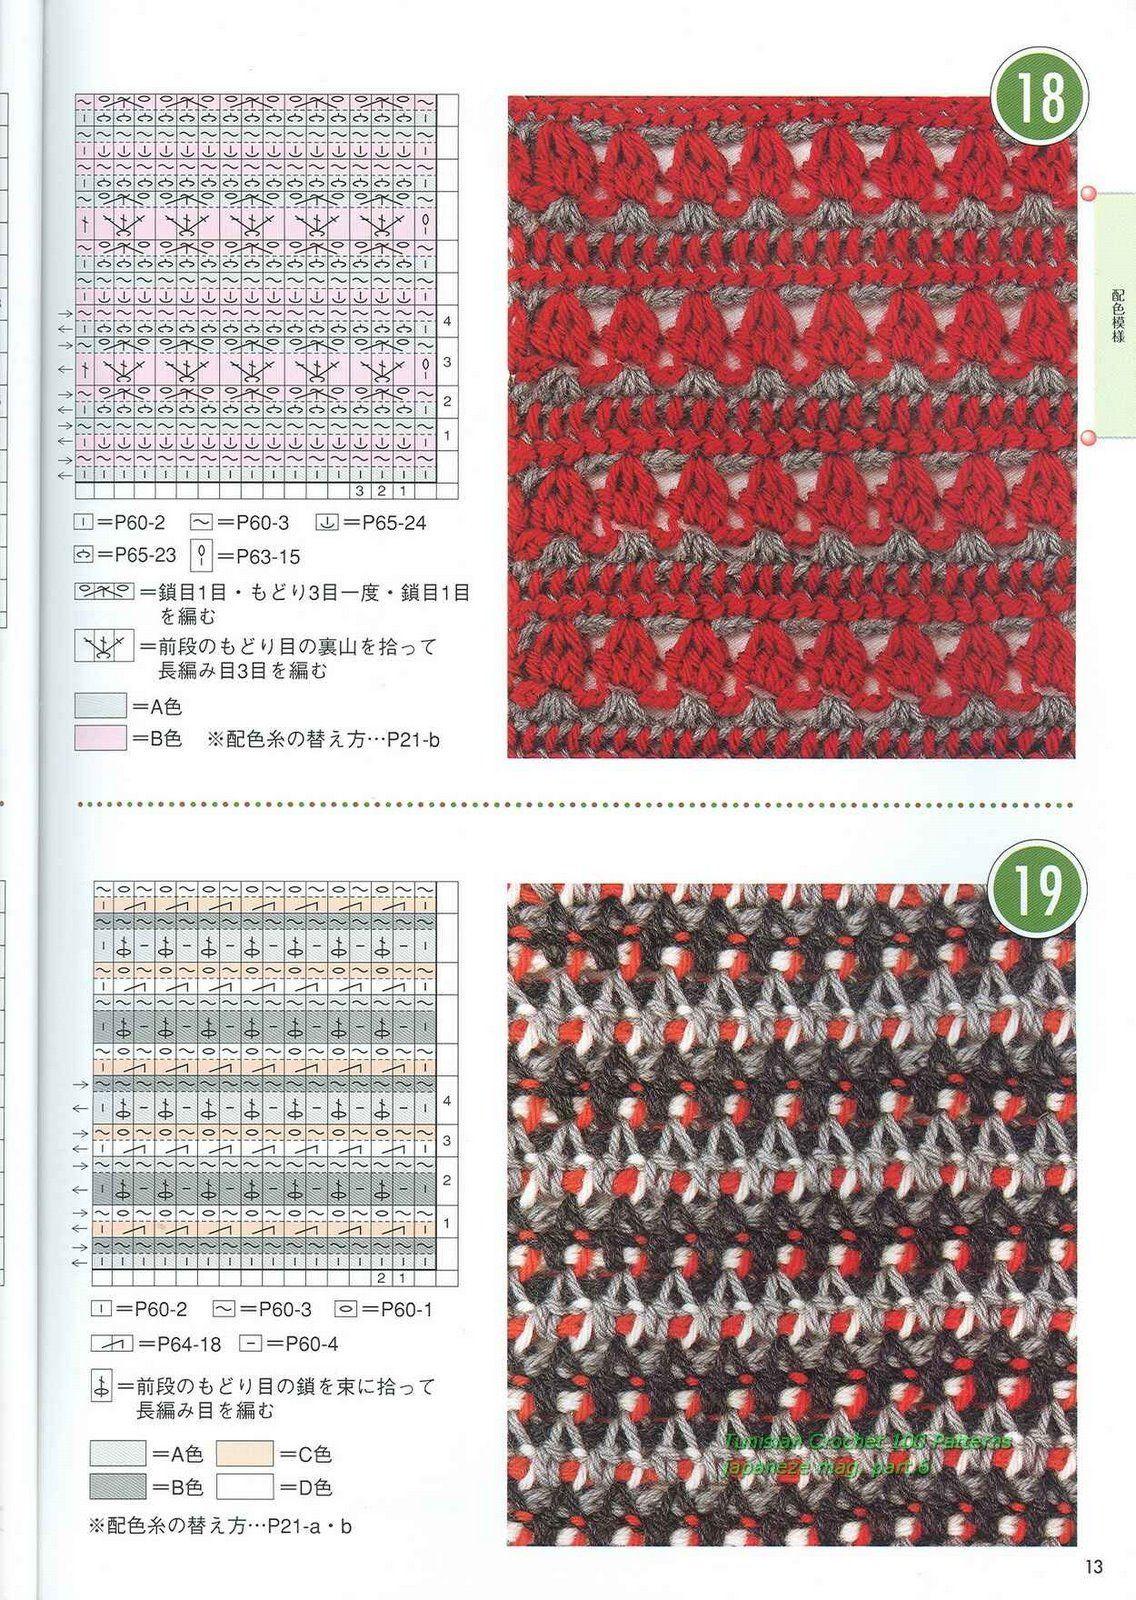 Pontos - Crochet Tunisiano | STITCHES (Crochet) | Pinterest ...